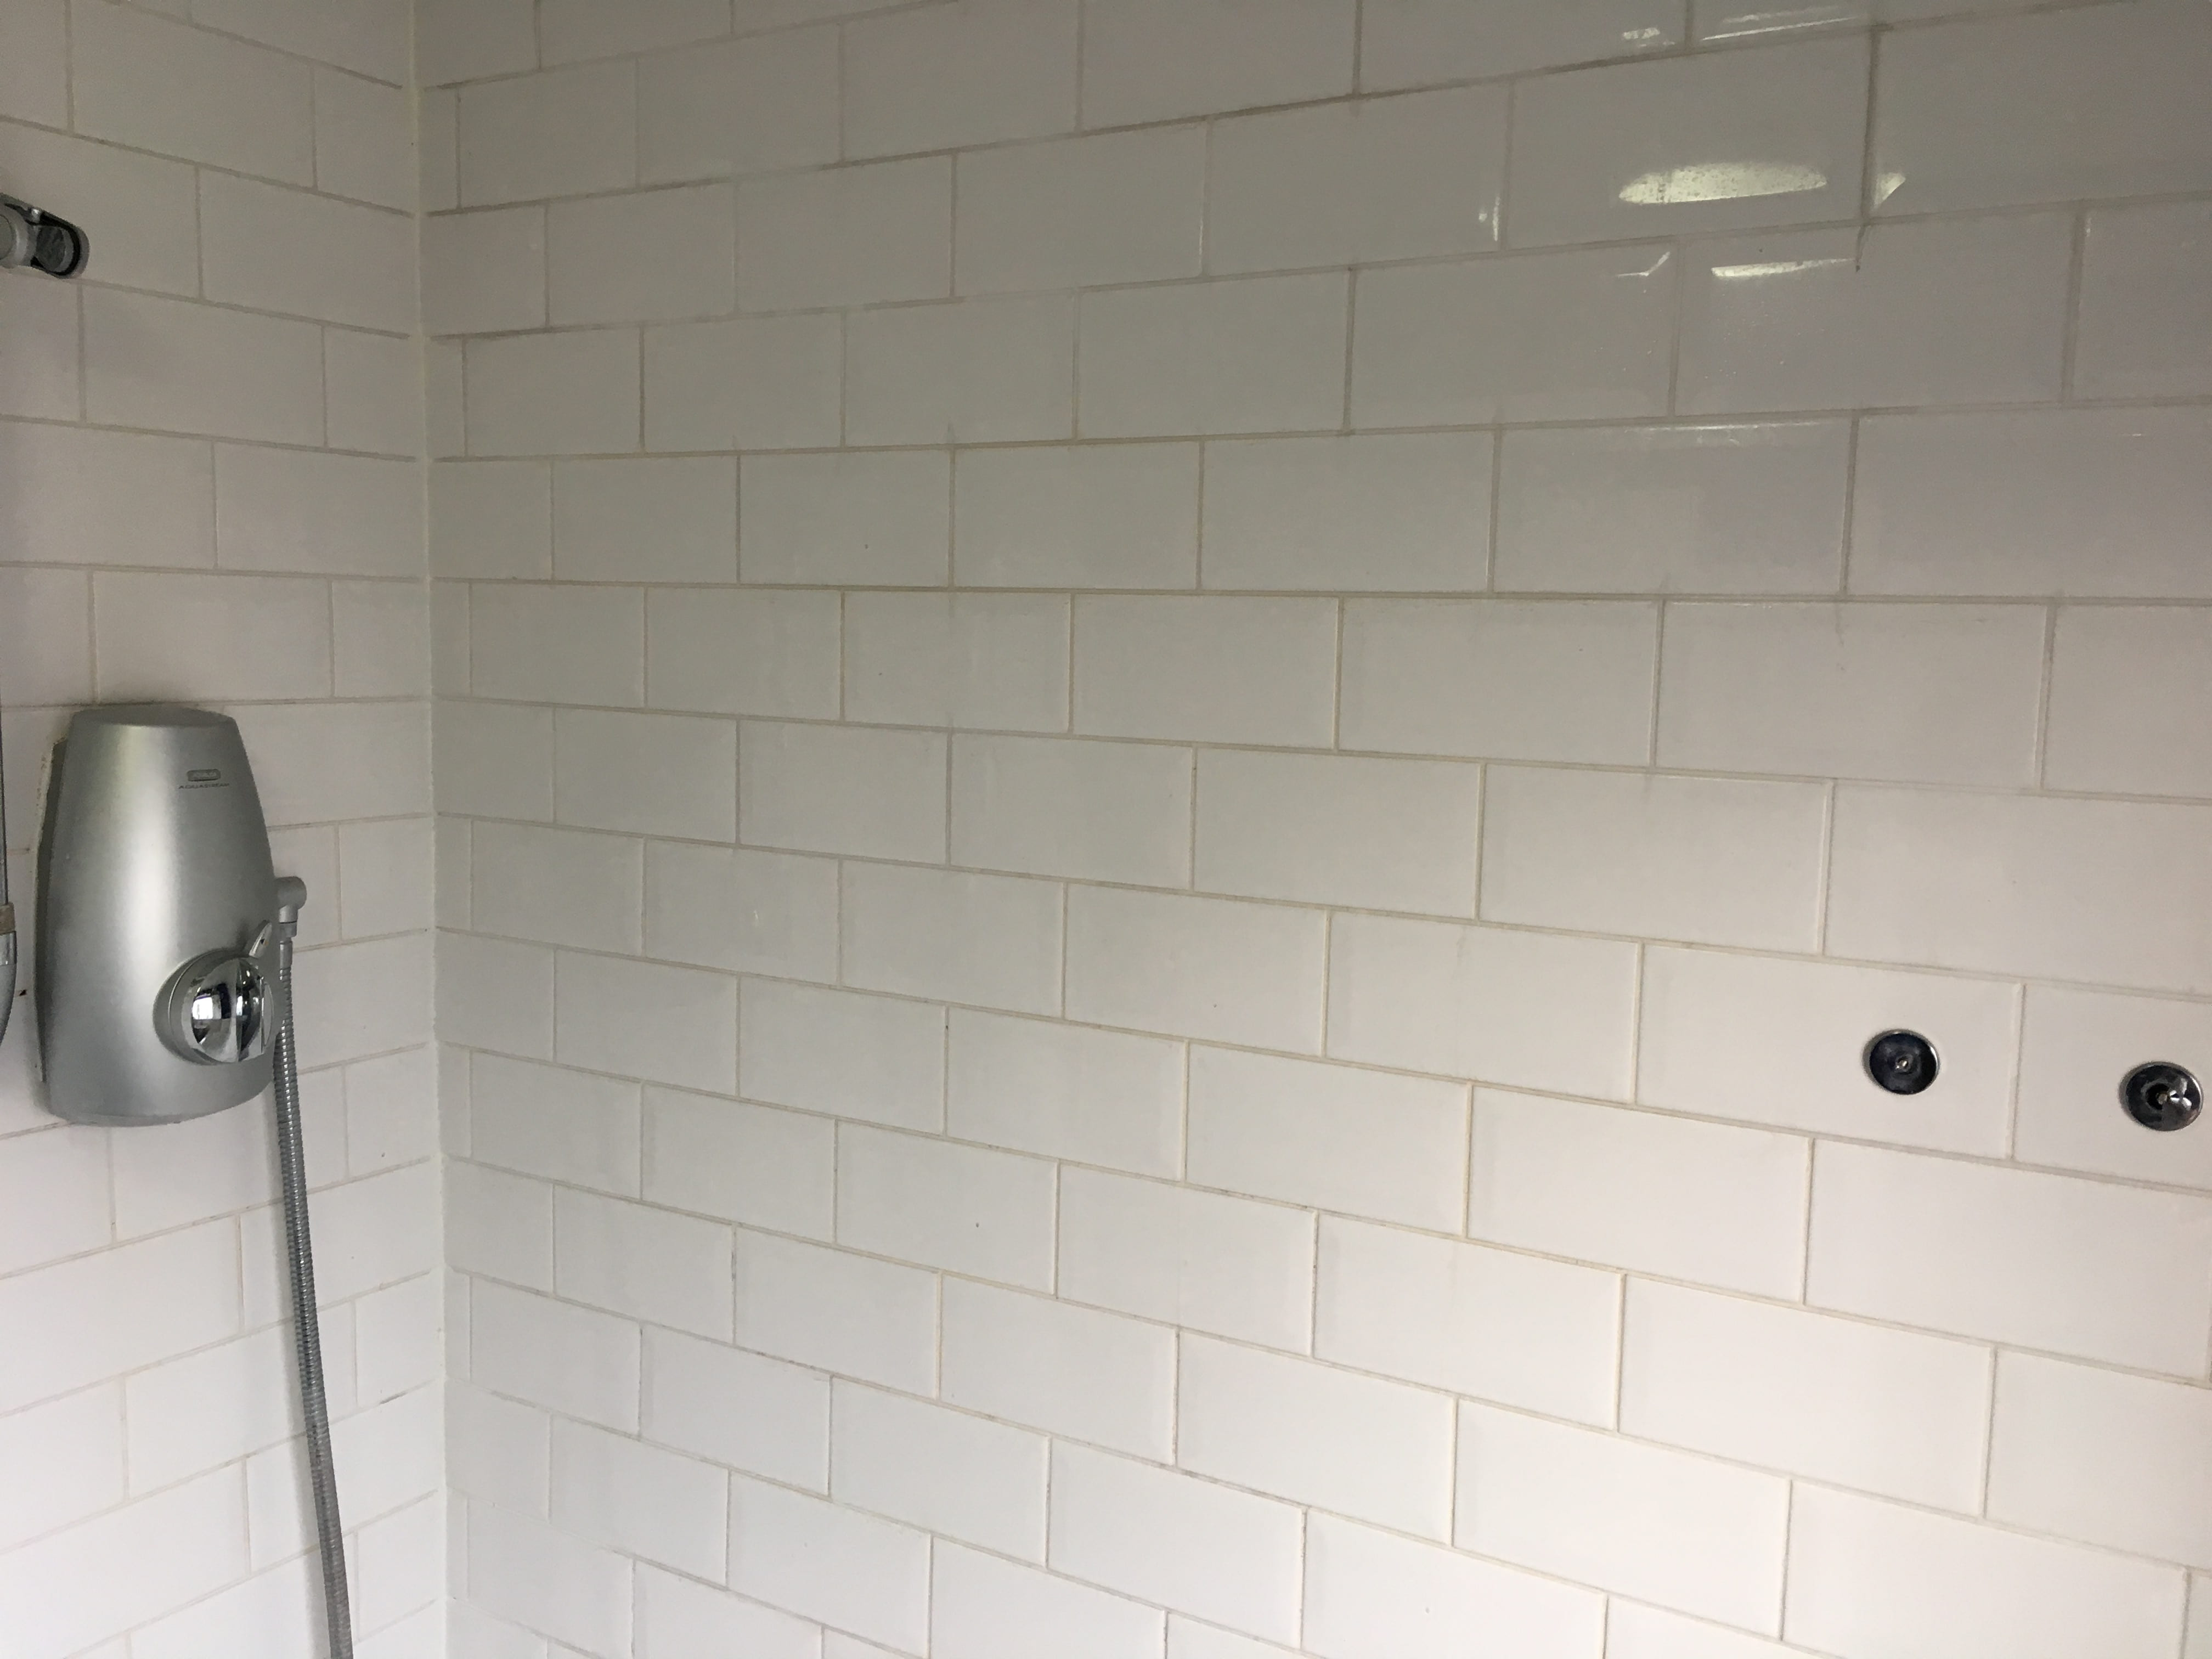 Ceramic Tiled Bathroom Before Cleaining Dorking